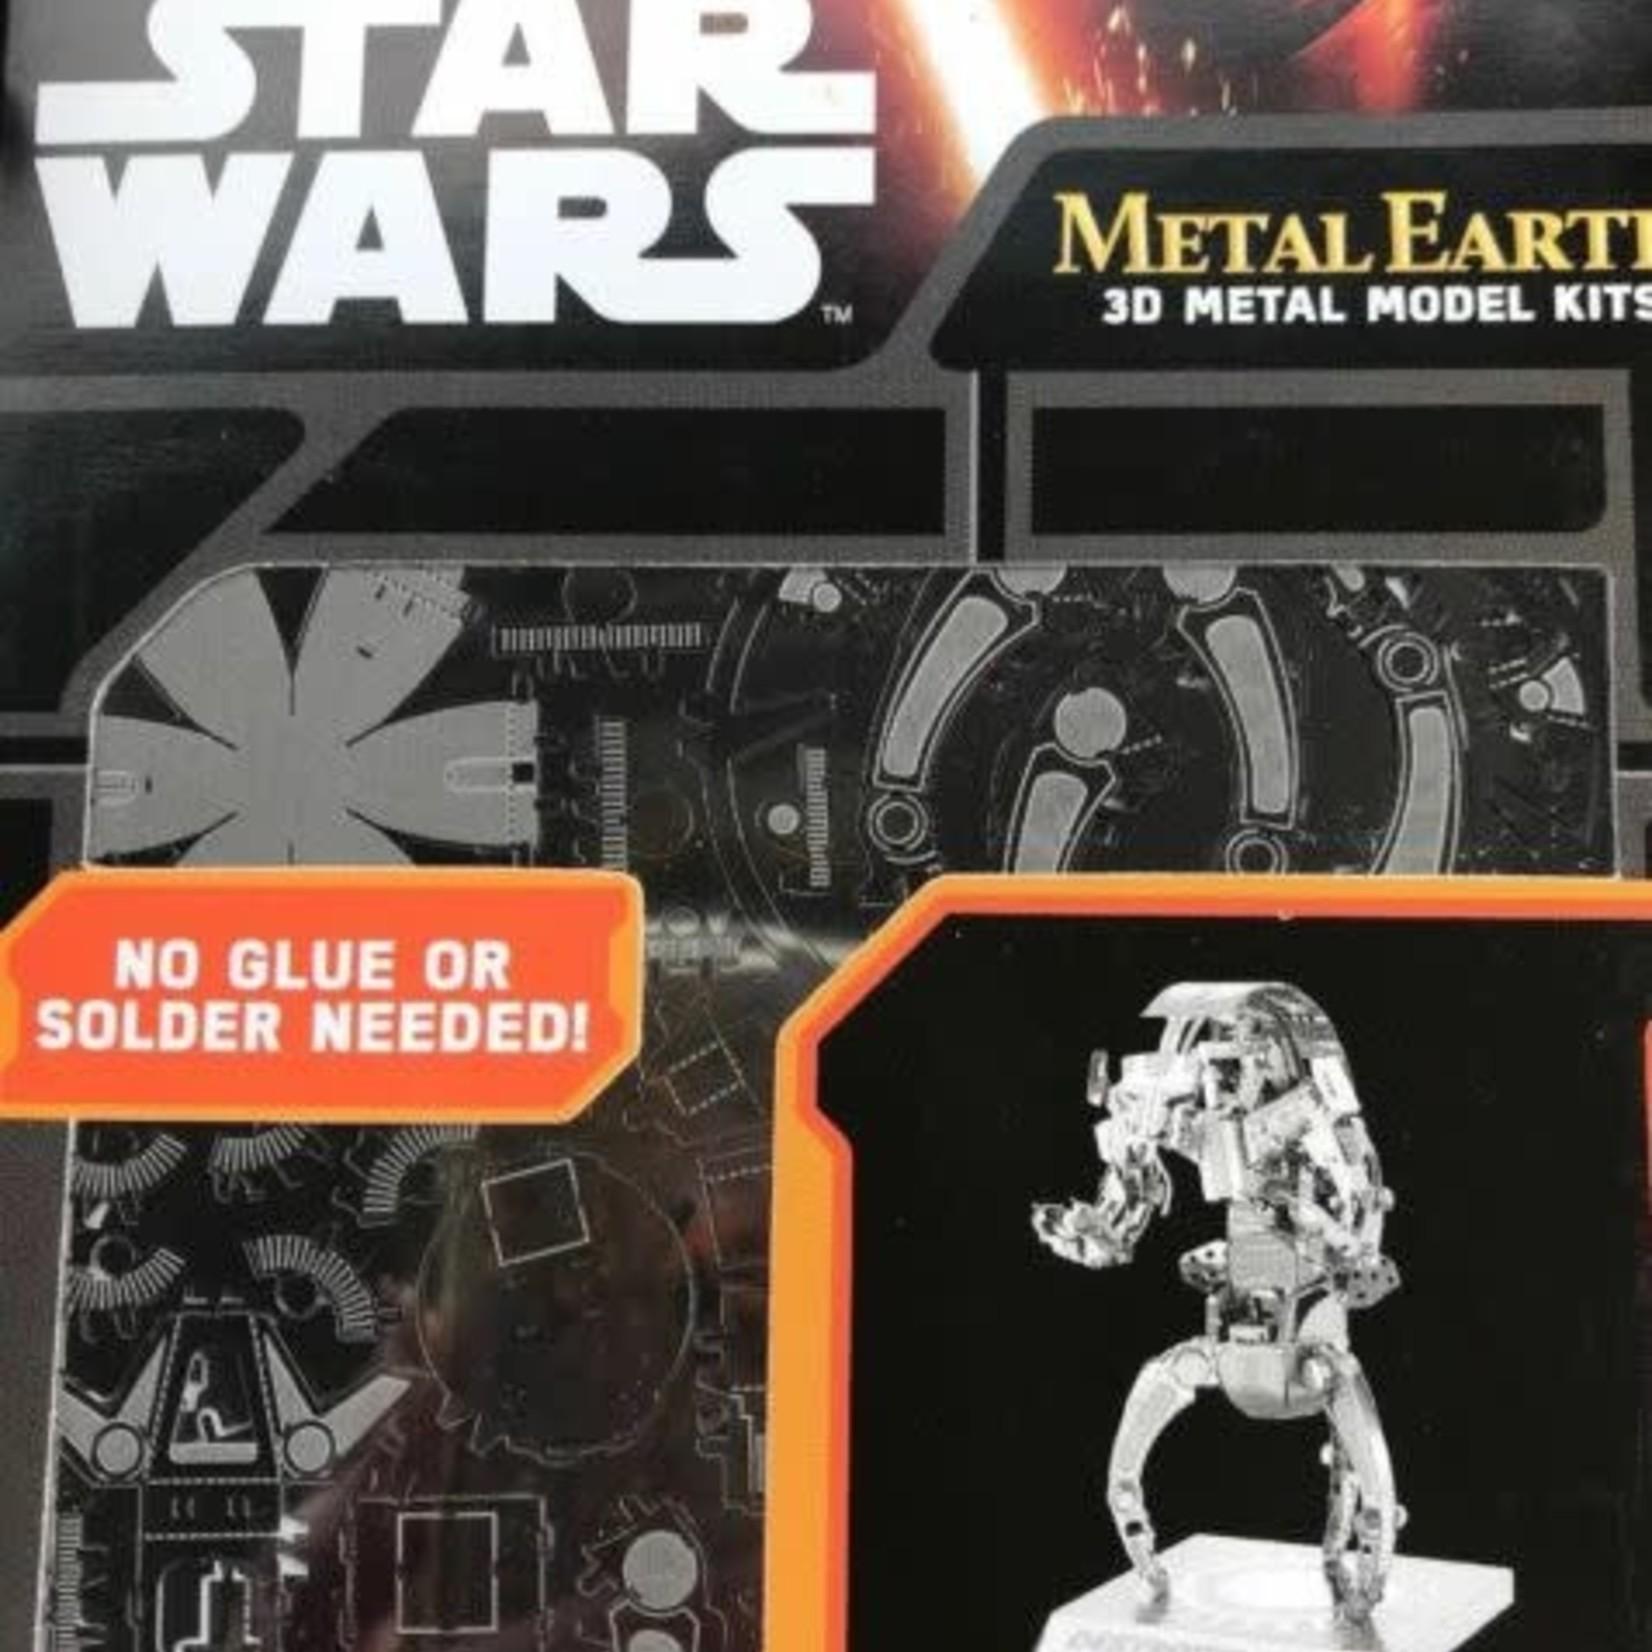 Metal Earth: Star Wars Destroyer Droid (2)